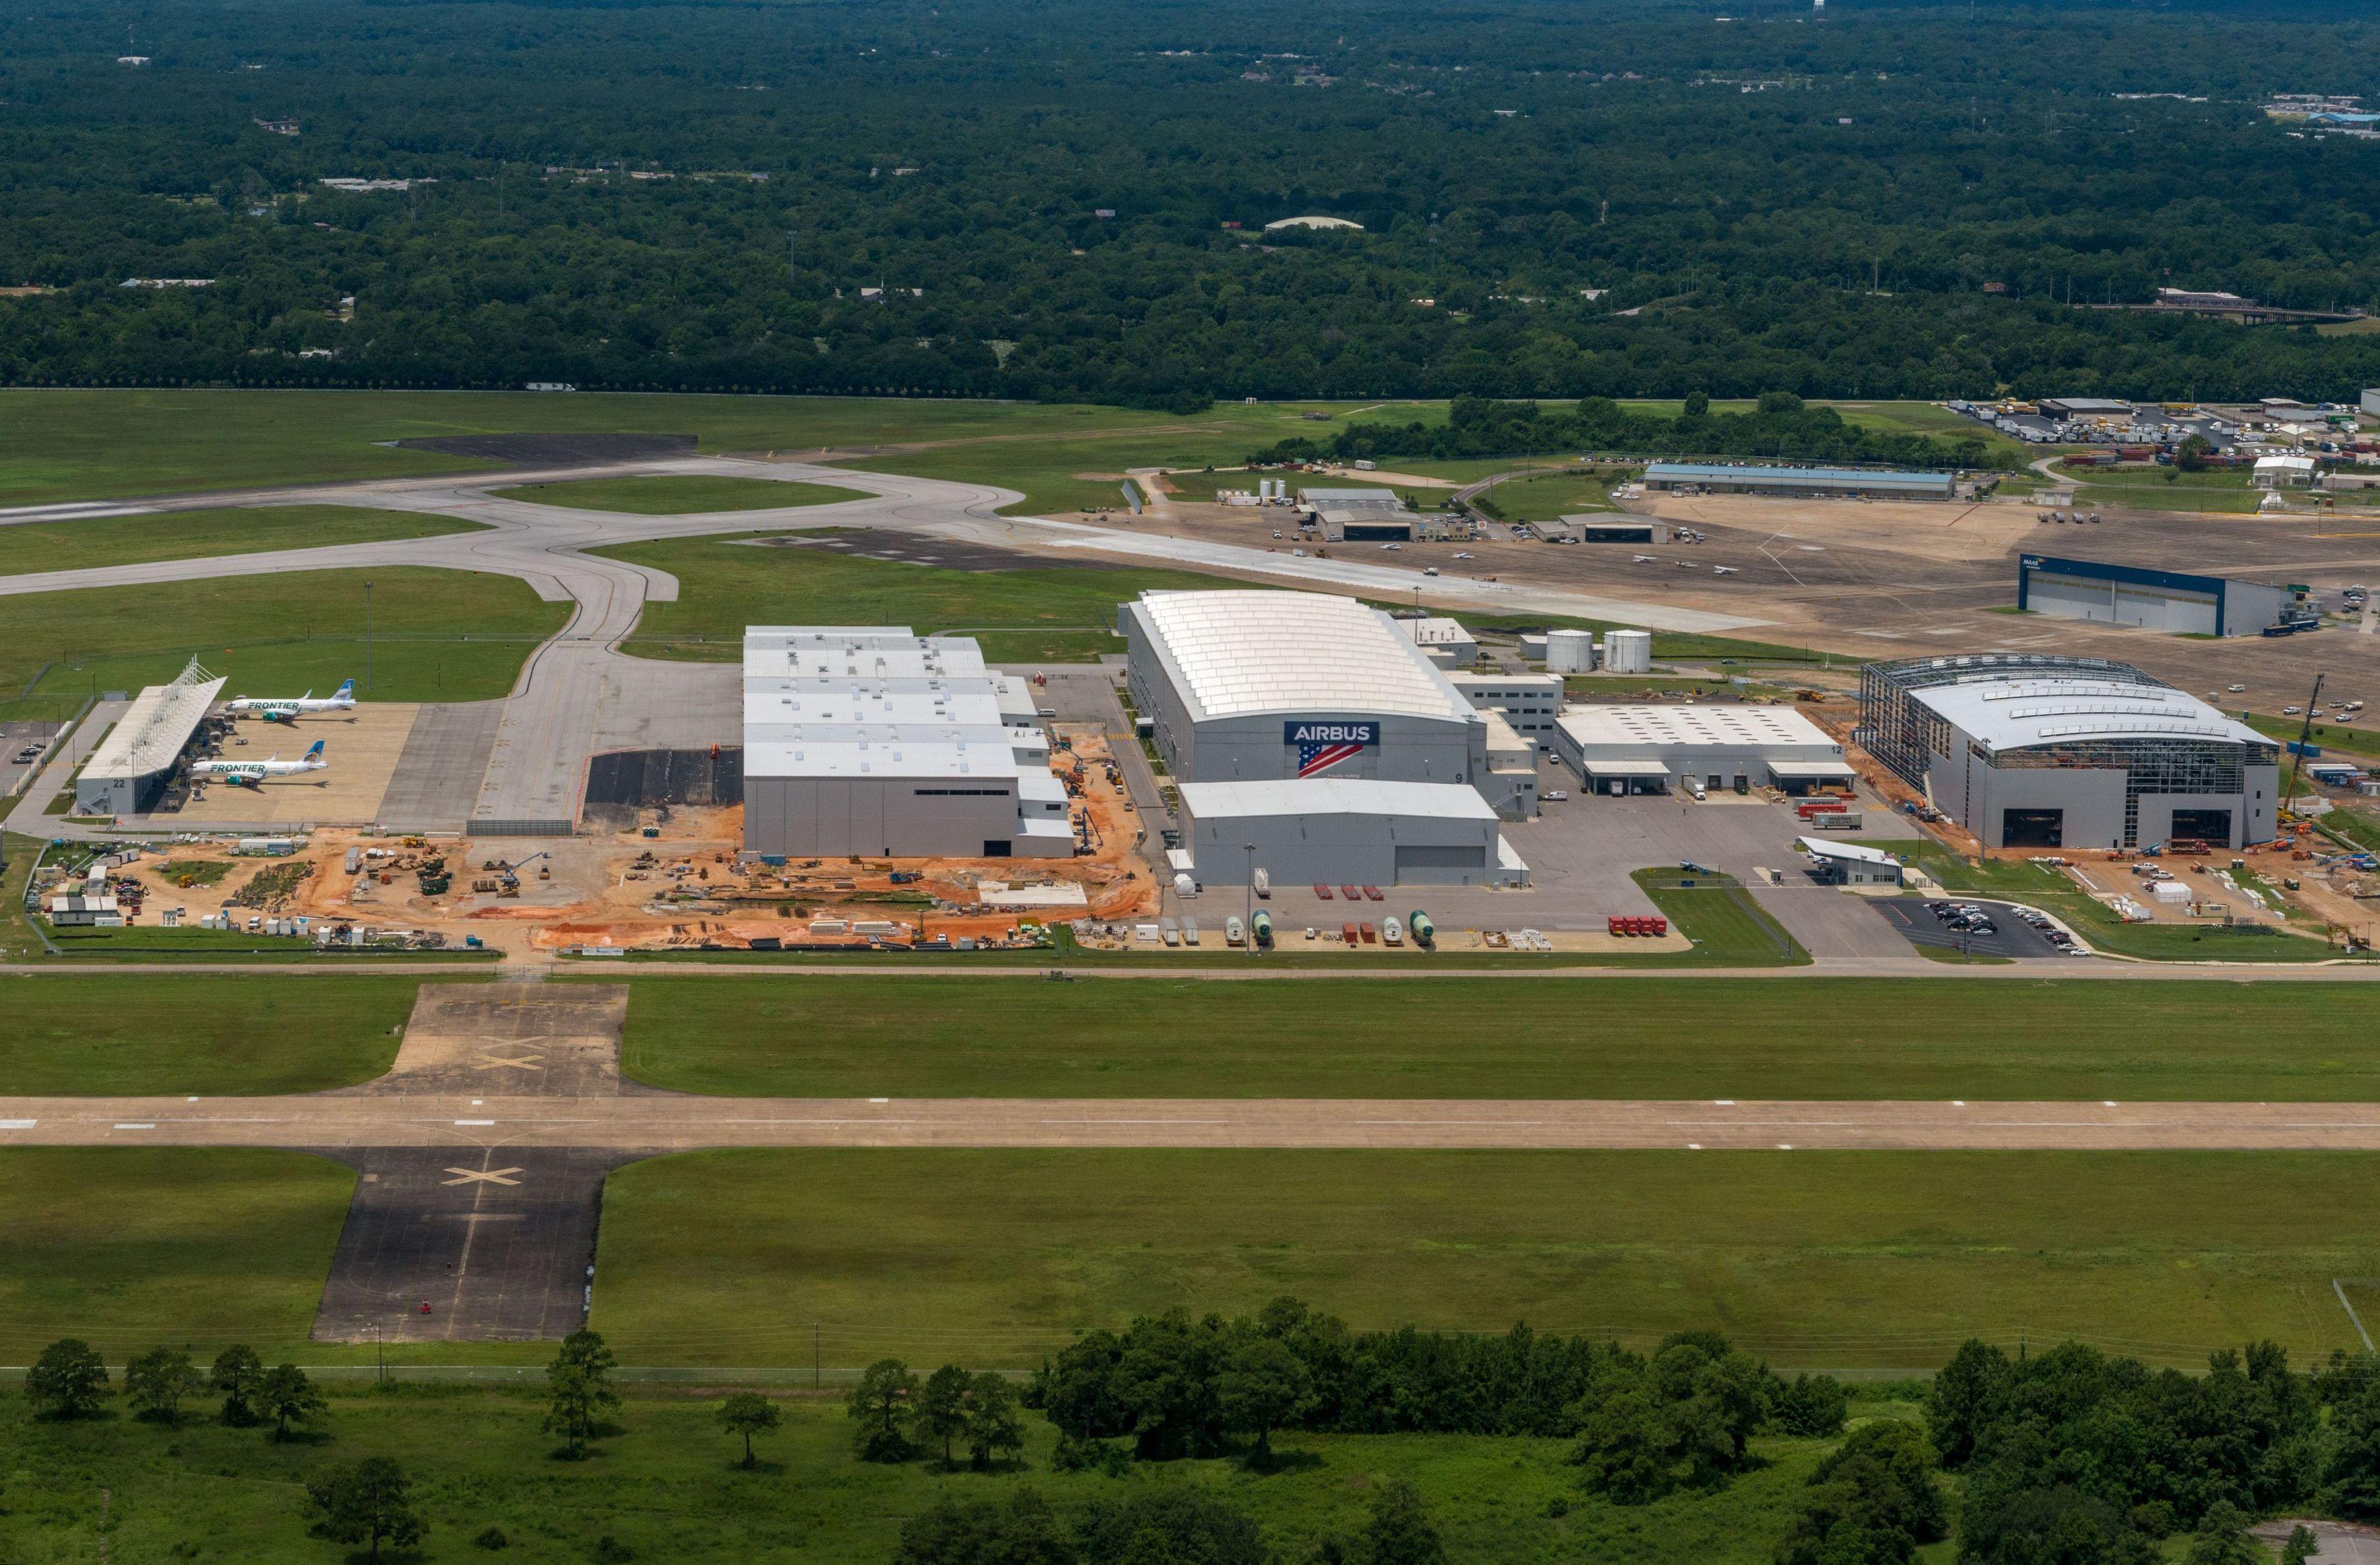 Airbus vil fremover producere A220 i nyt fabriksanlæg i den amerikanske delstat Alabama. Foto: Airbus